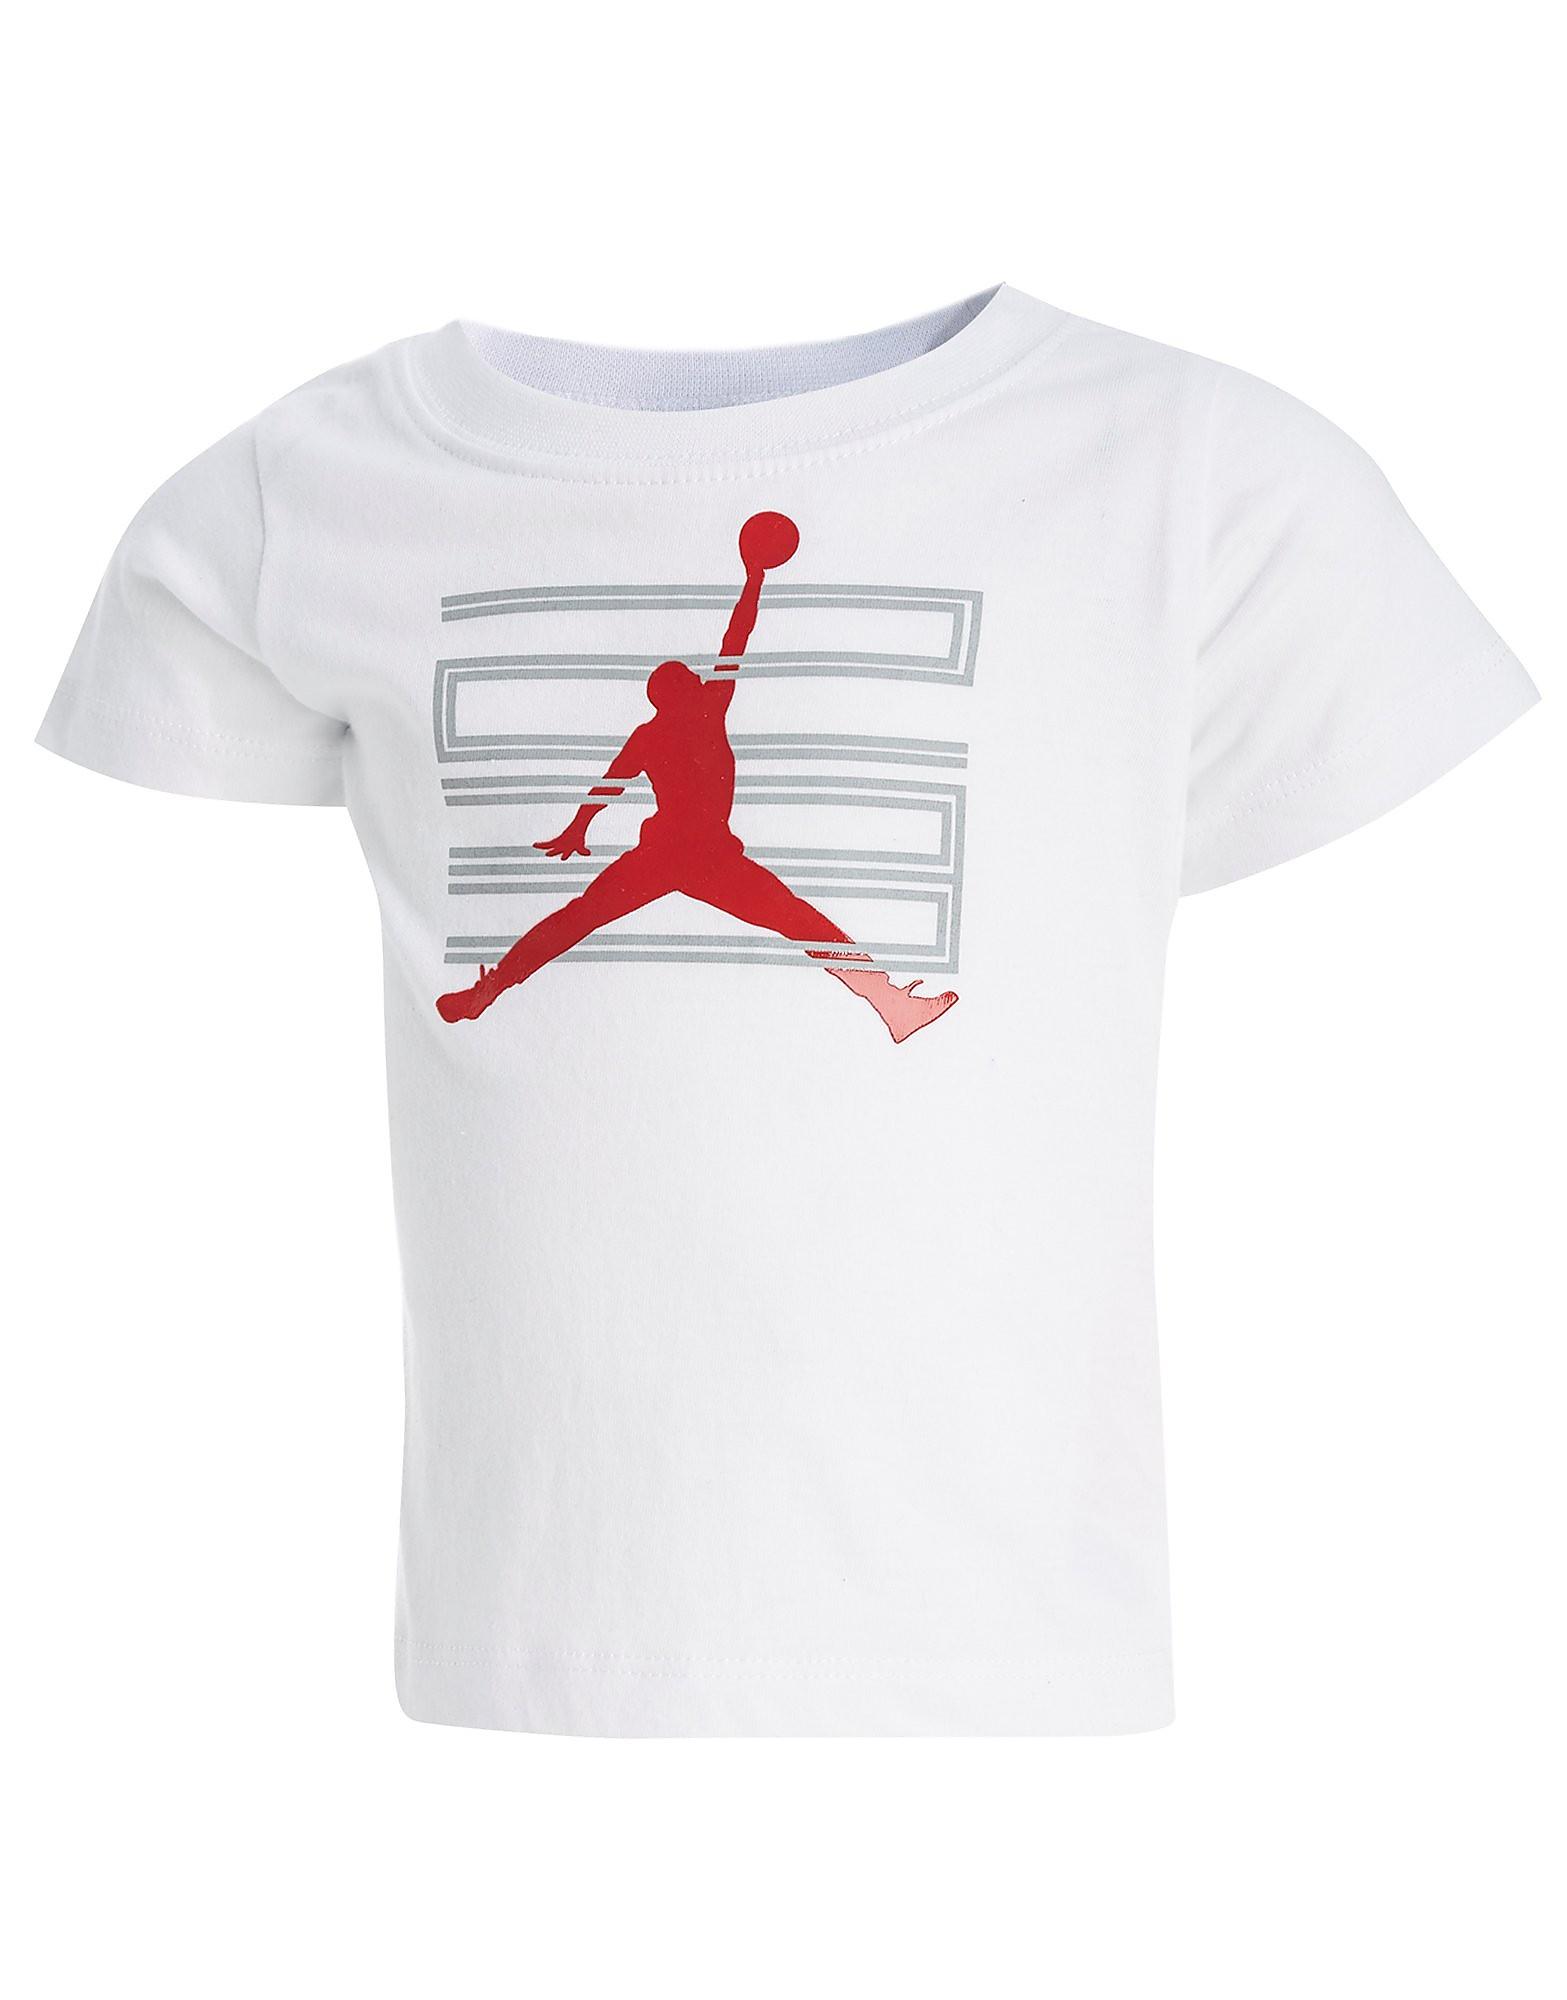 Jordan Air 11 T-Shirt Infant